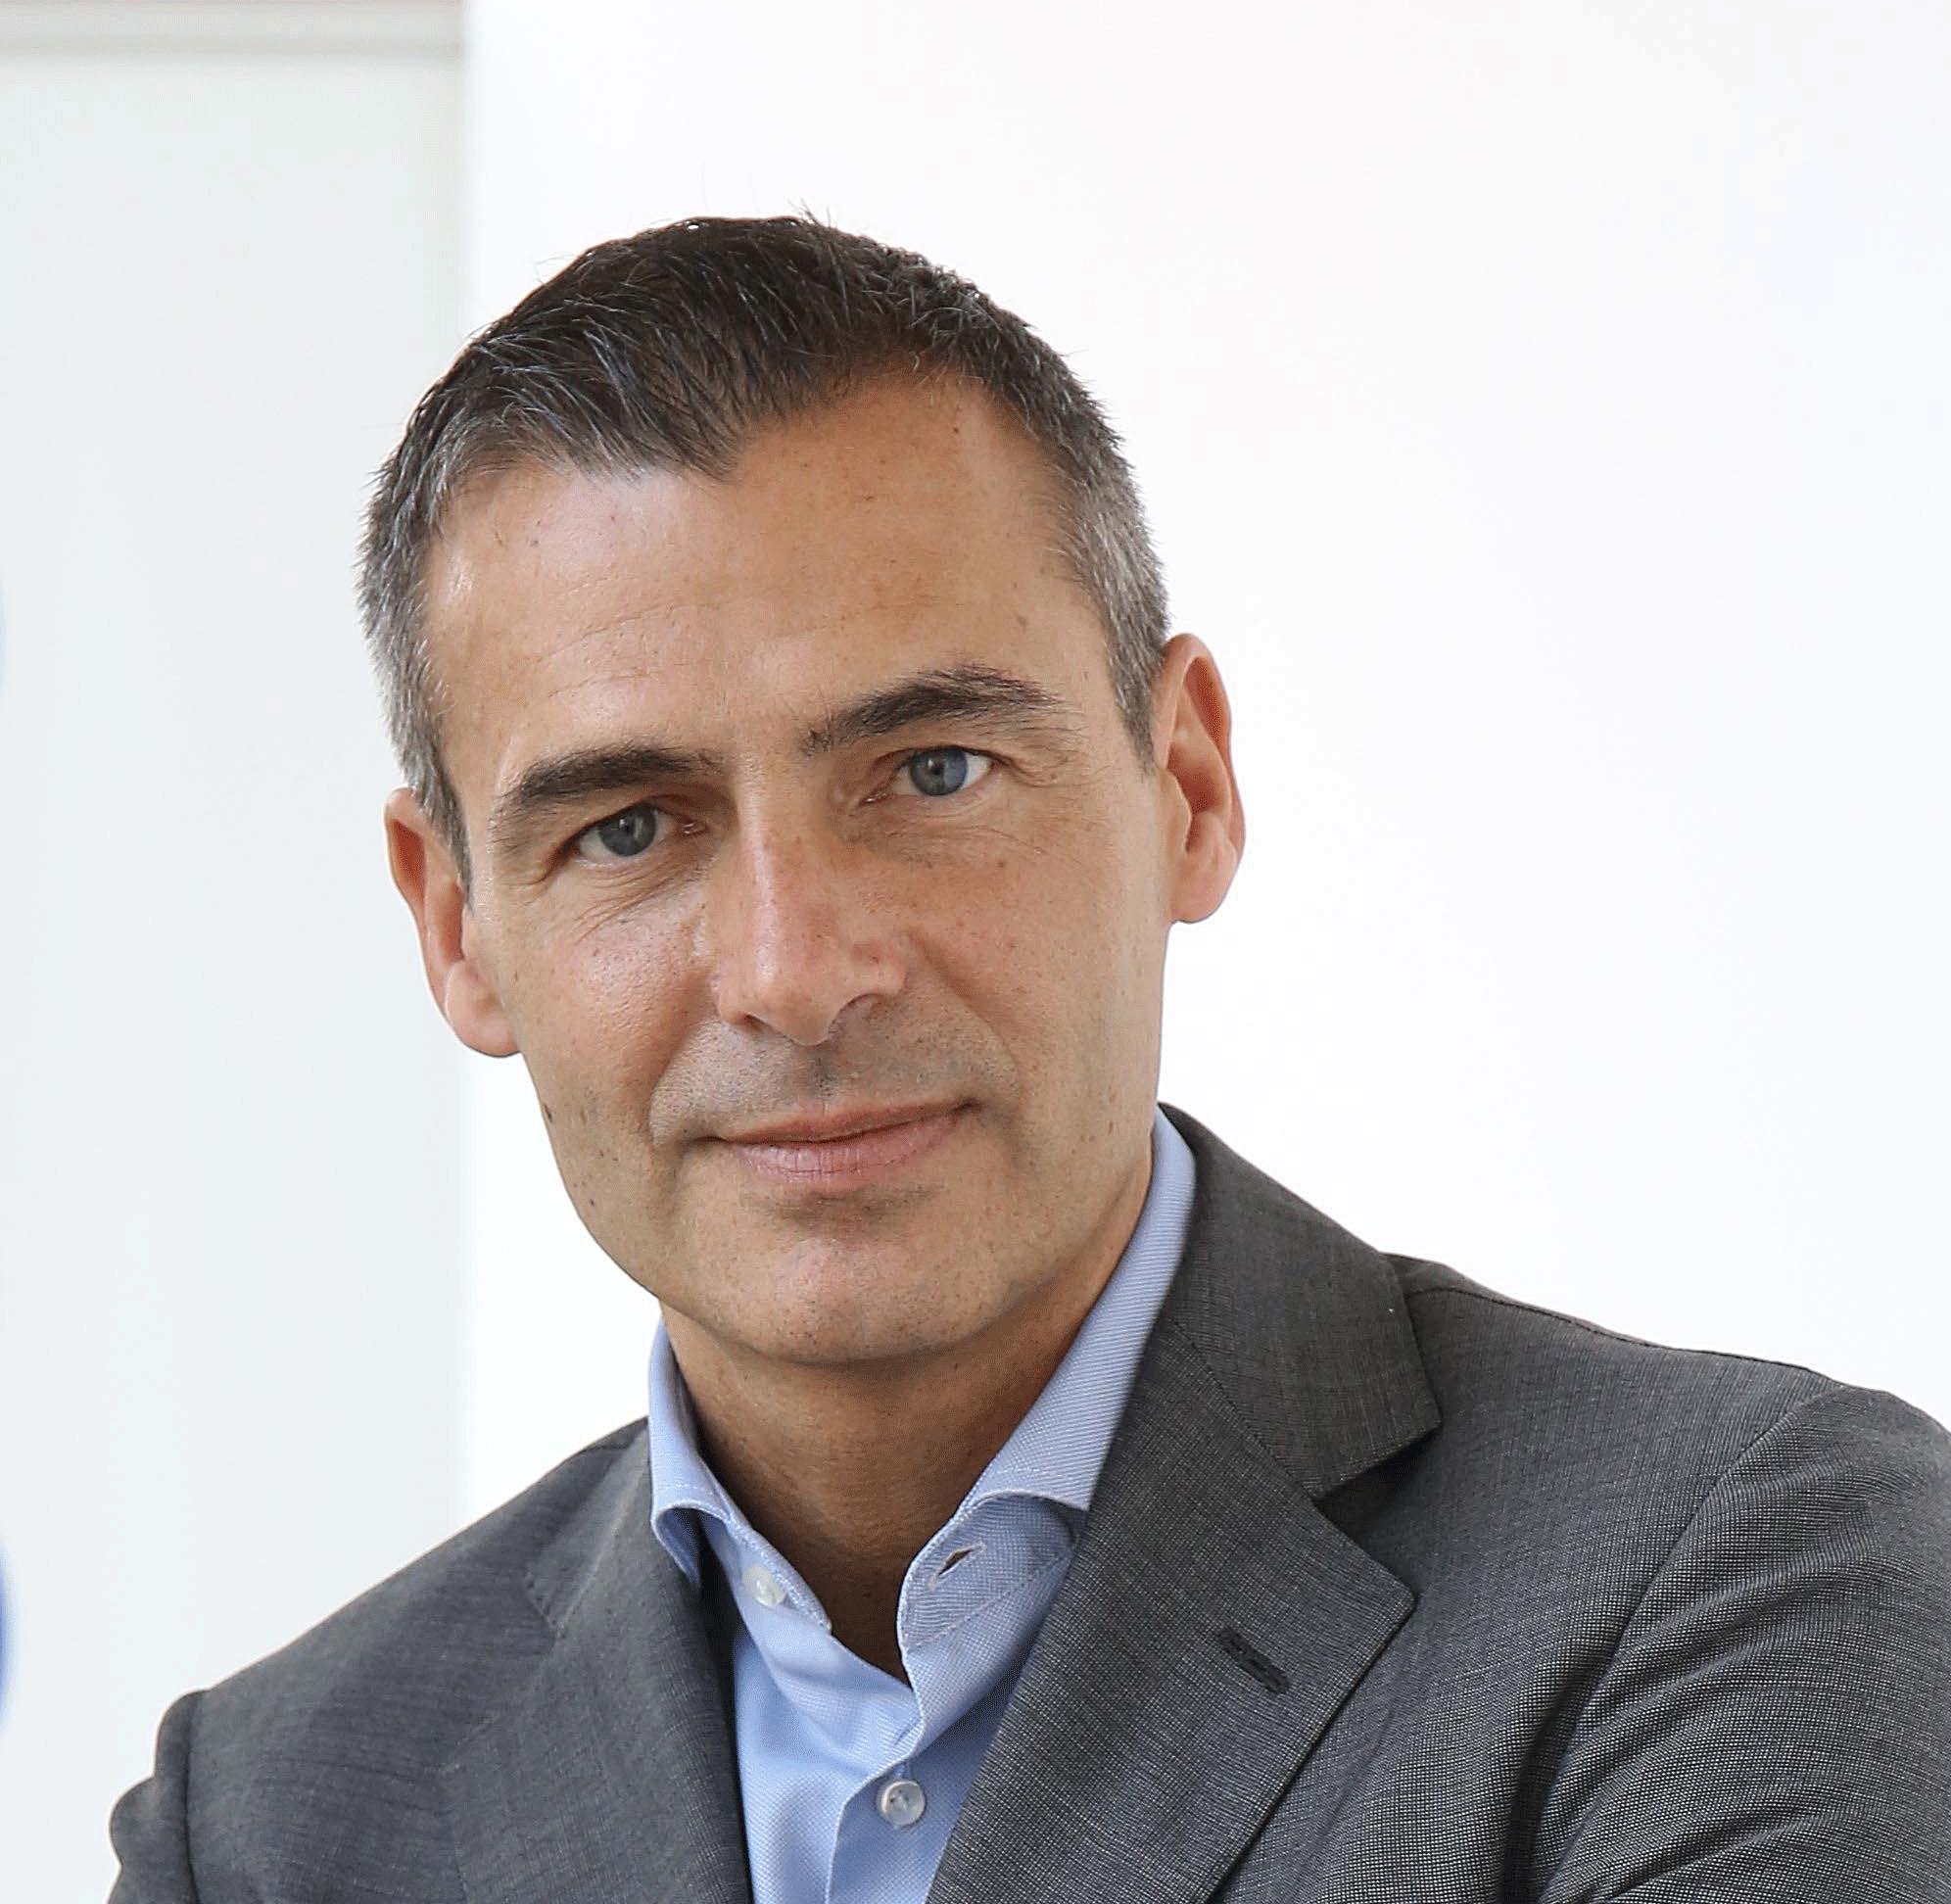 Mauro Palmigiani, Head of Enterprise Business Division di Samsung Electronics Italia